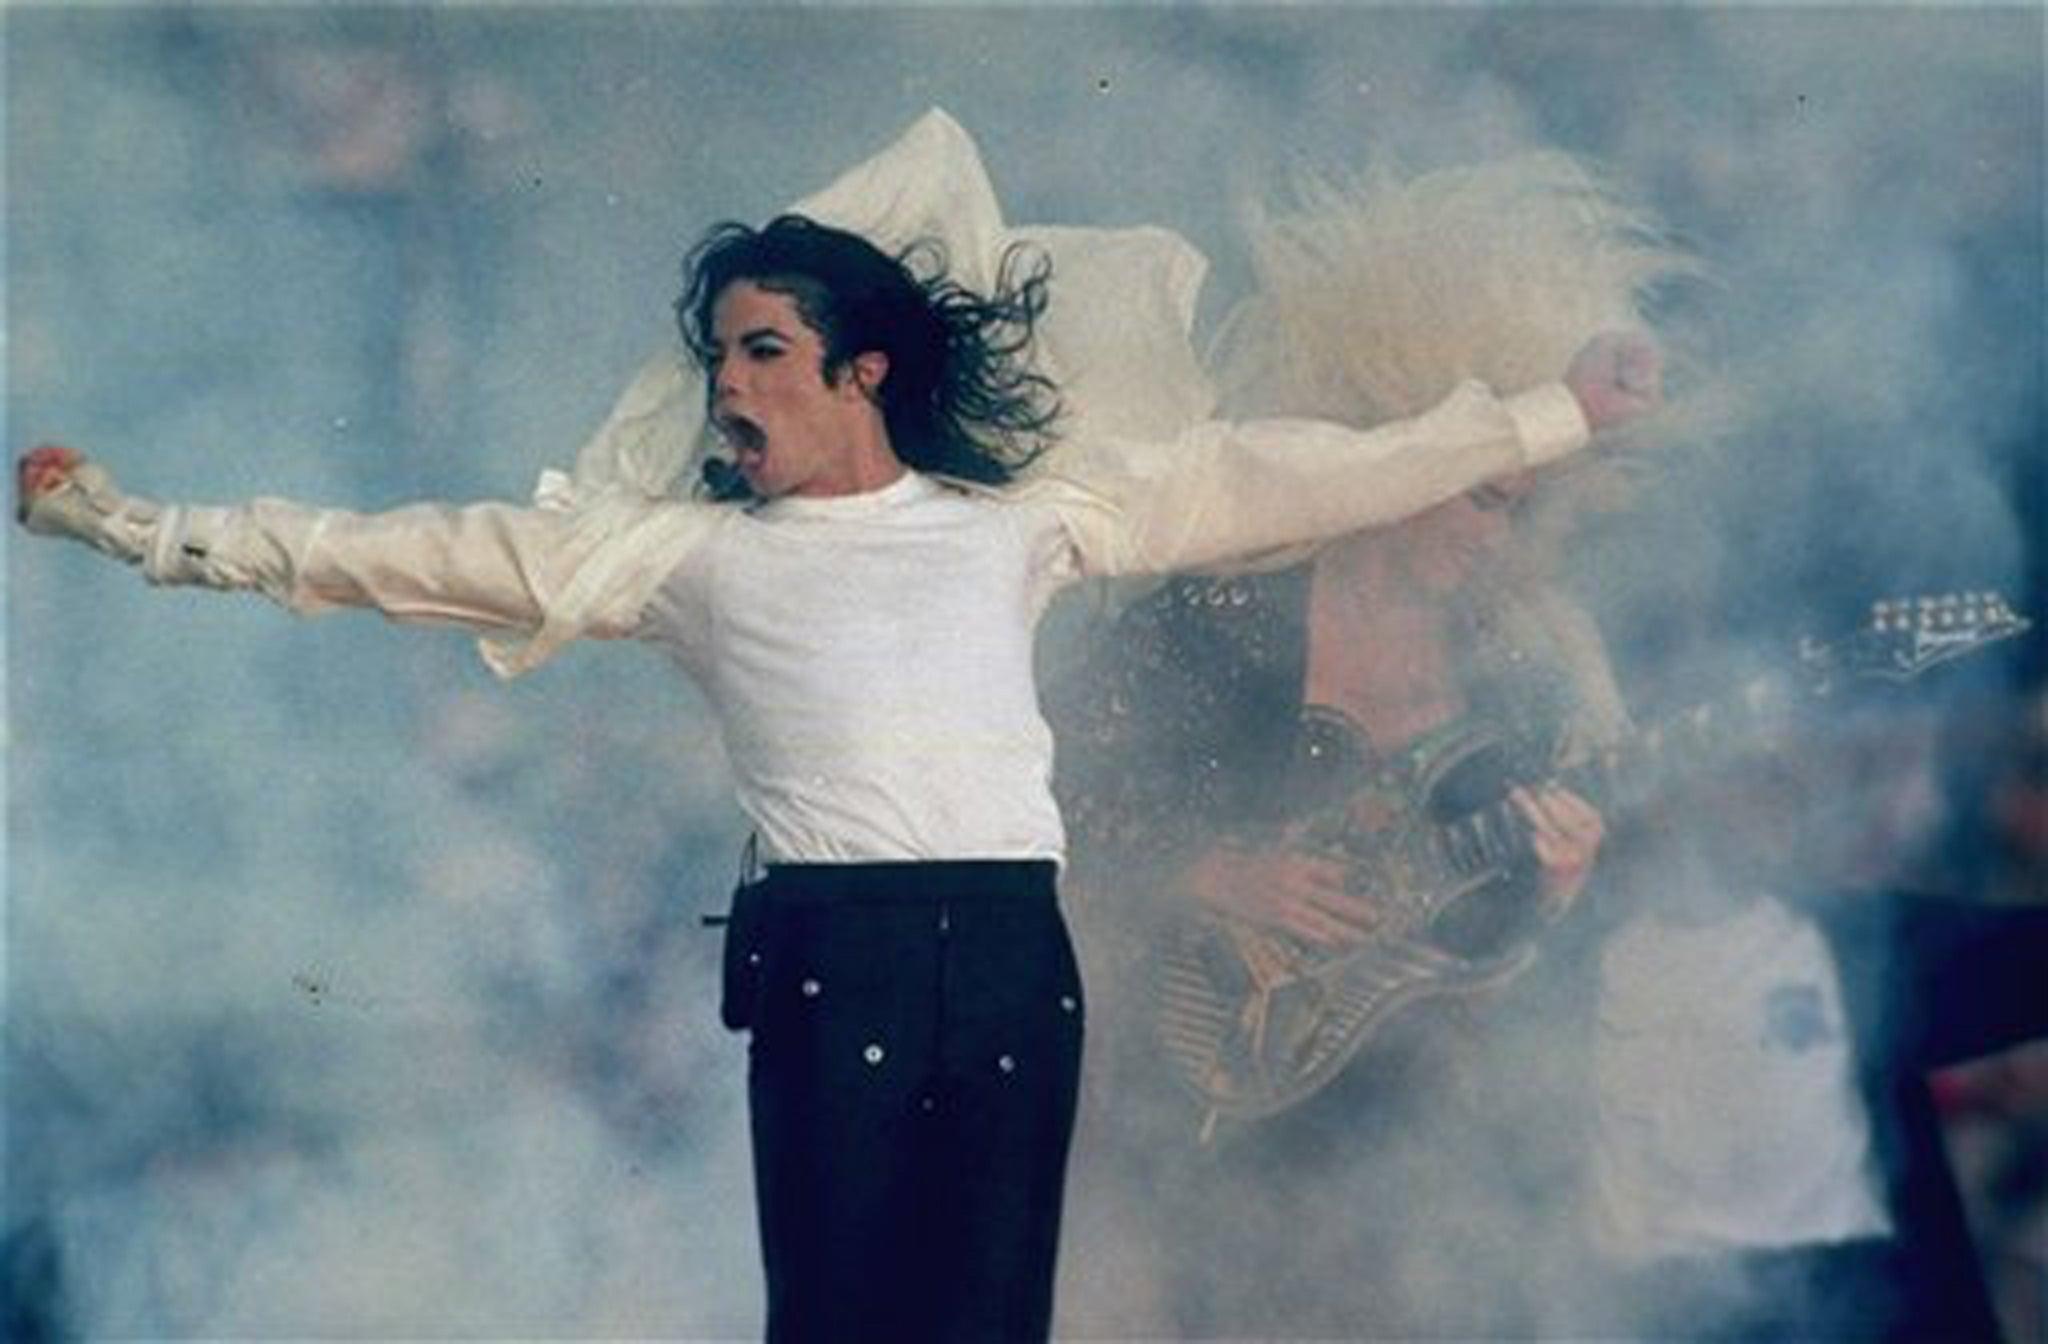 Memoir reveals Michael Jackson\'s favourite pastime was laughing at ...